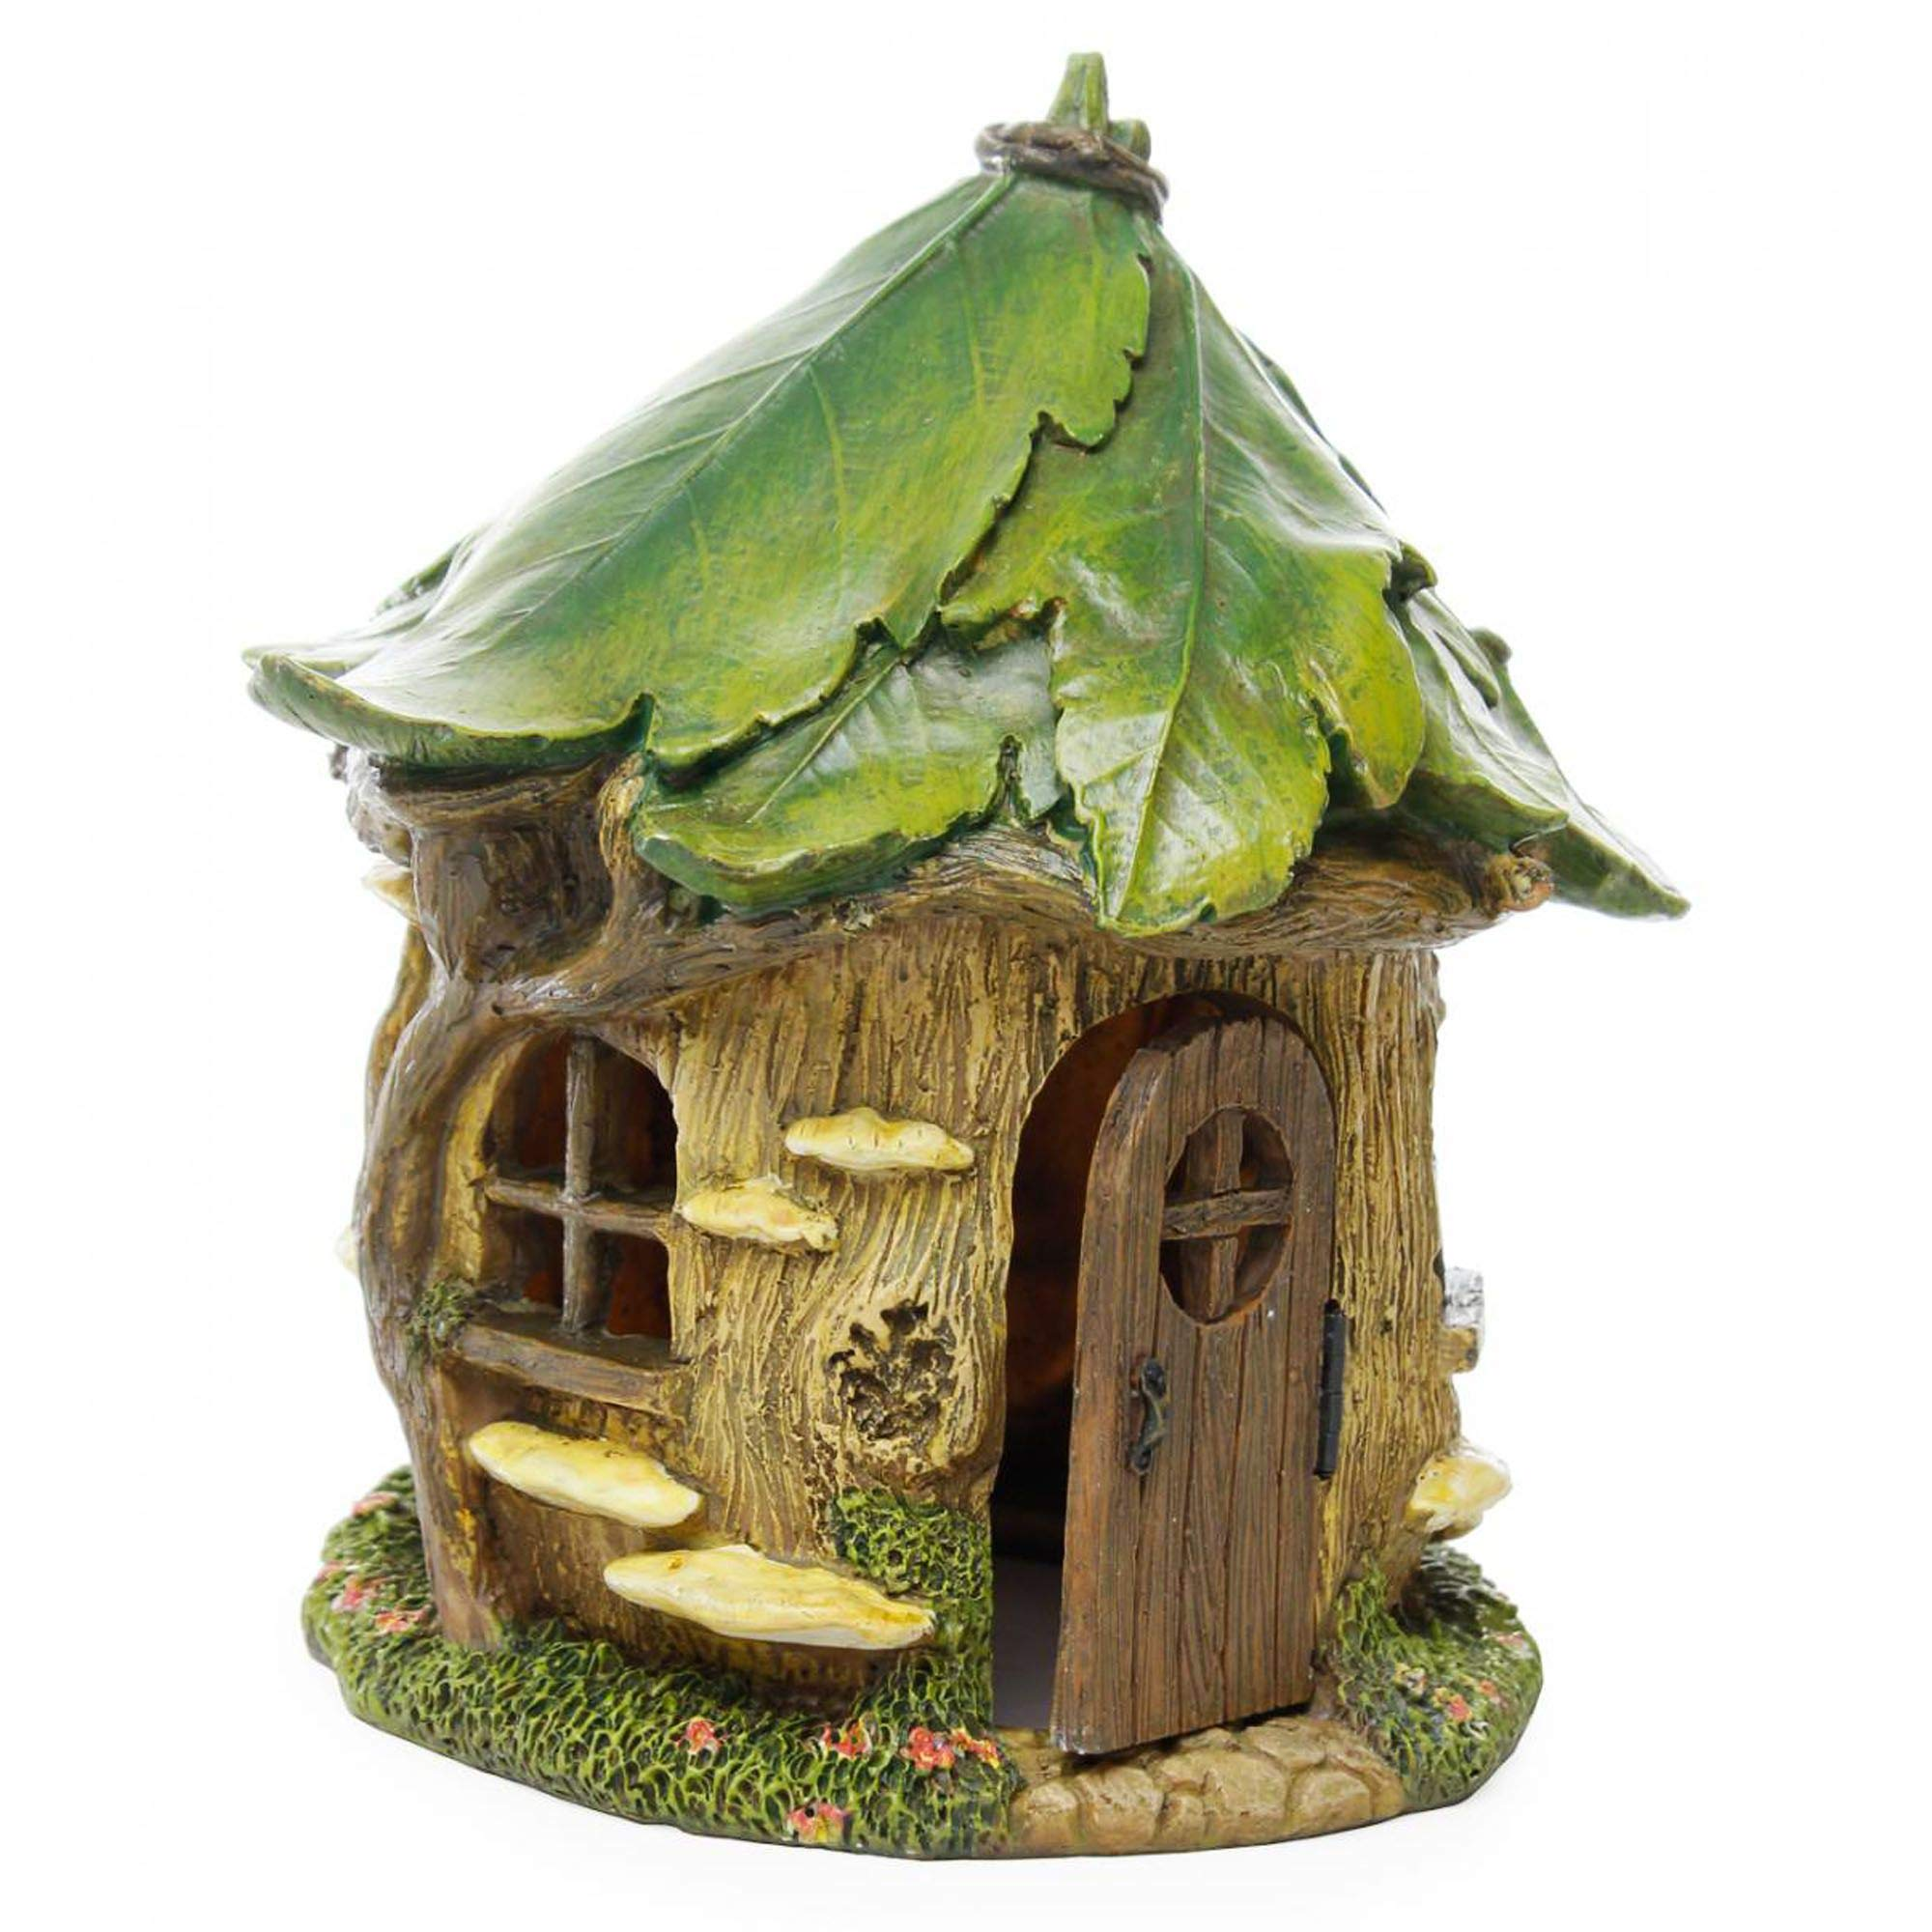 Miniature Forest House Fairy Gnome Cottage - Yard Garden Decor